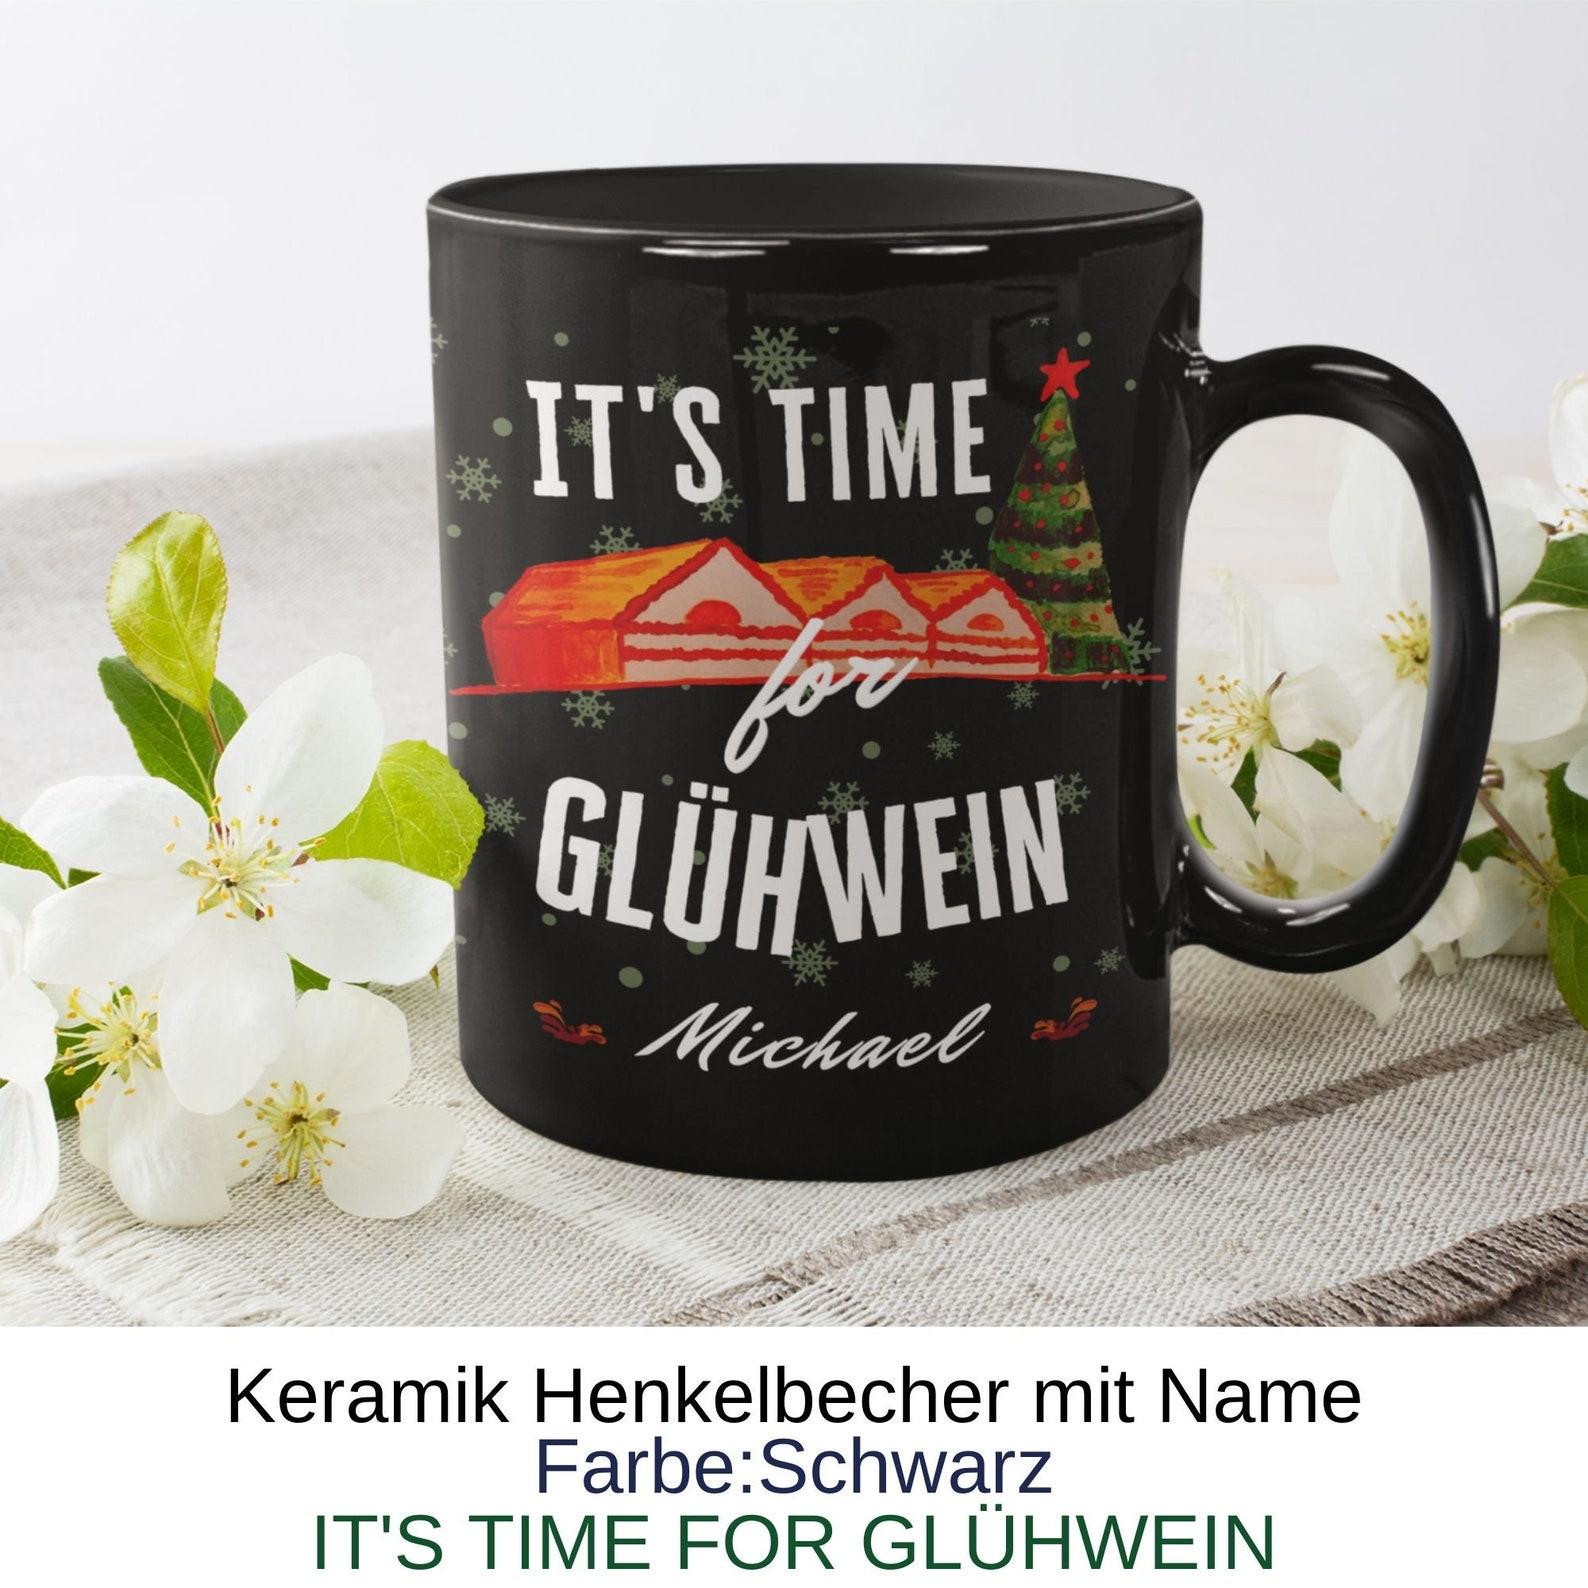 It's Time Glühwein personalized